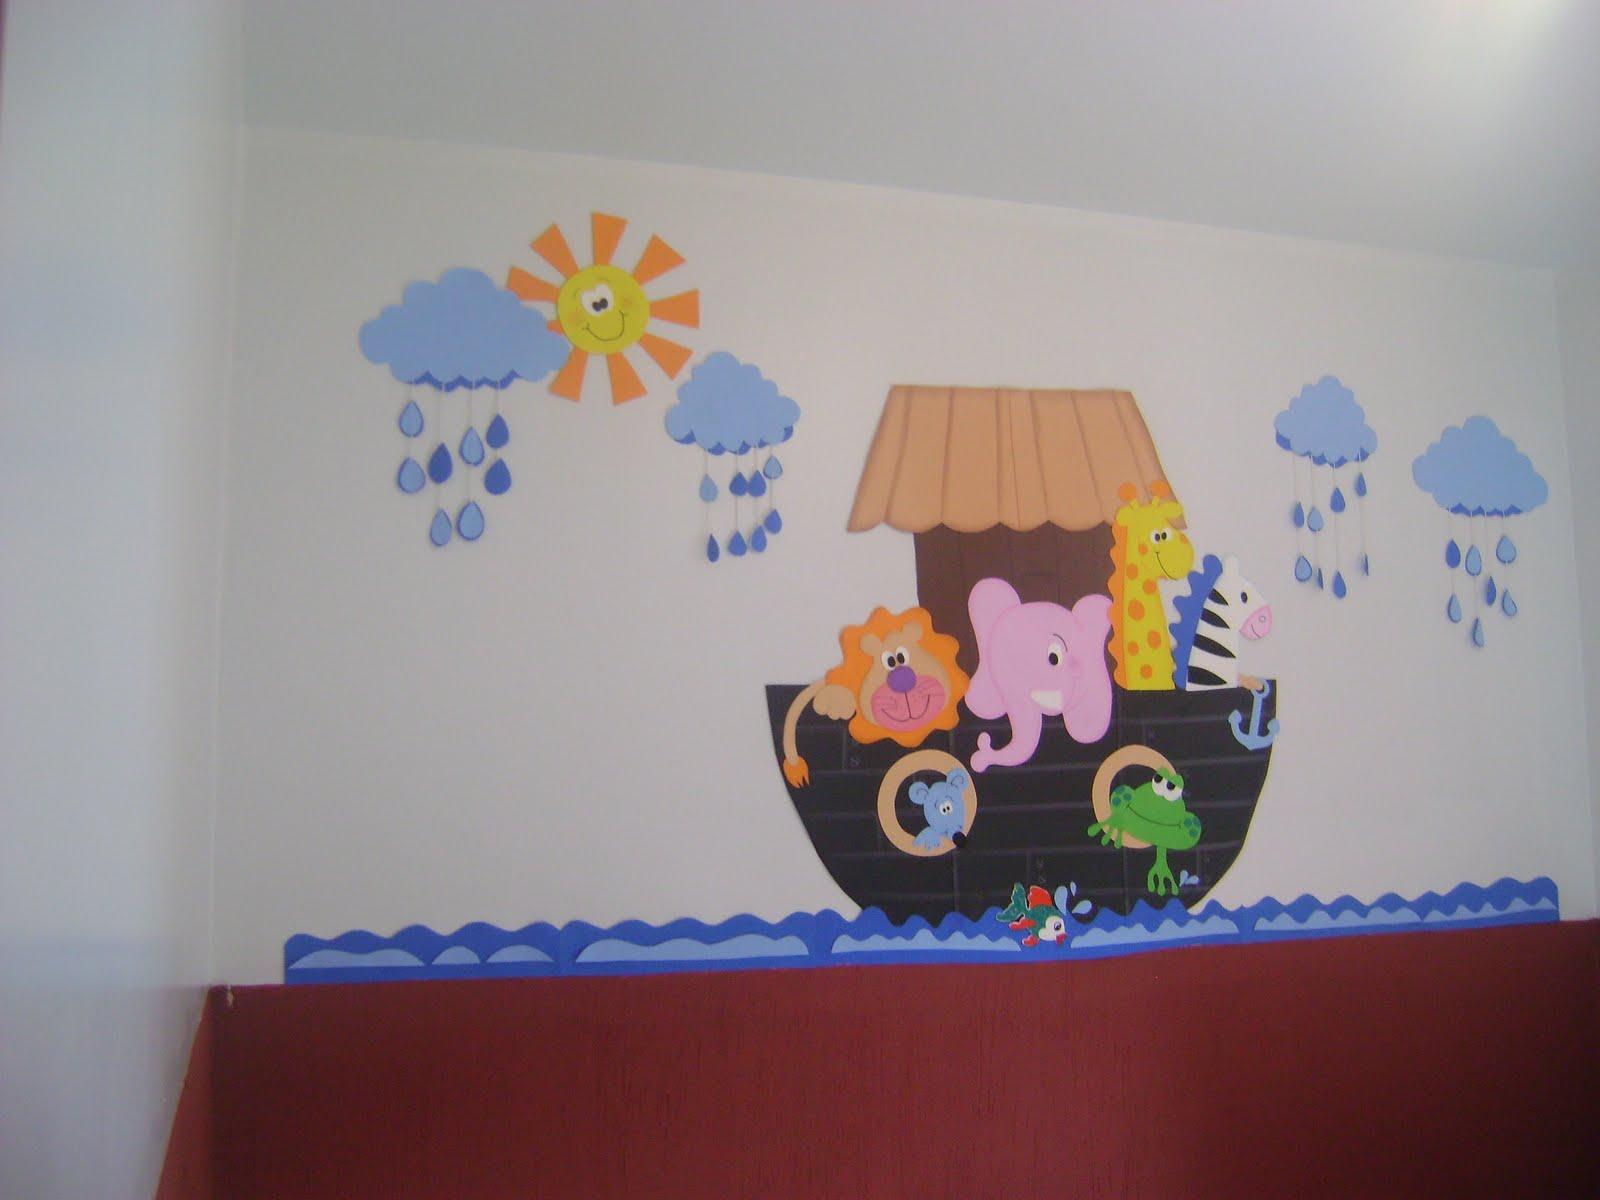 decoracao de sala infantil escola dominical : decoracao de sala infantil escola dominical:Nenhum comentário: